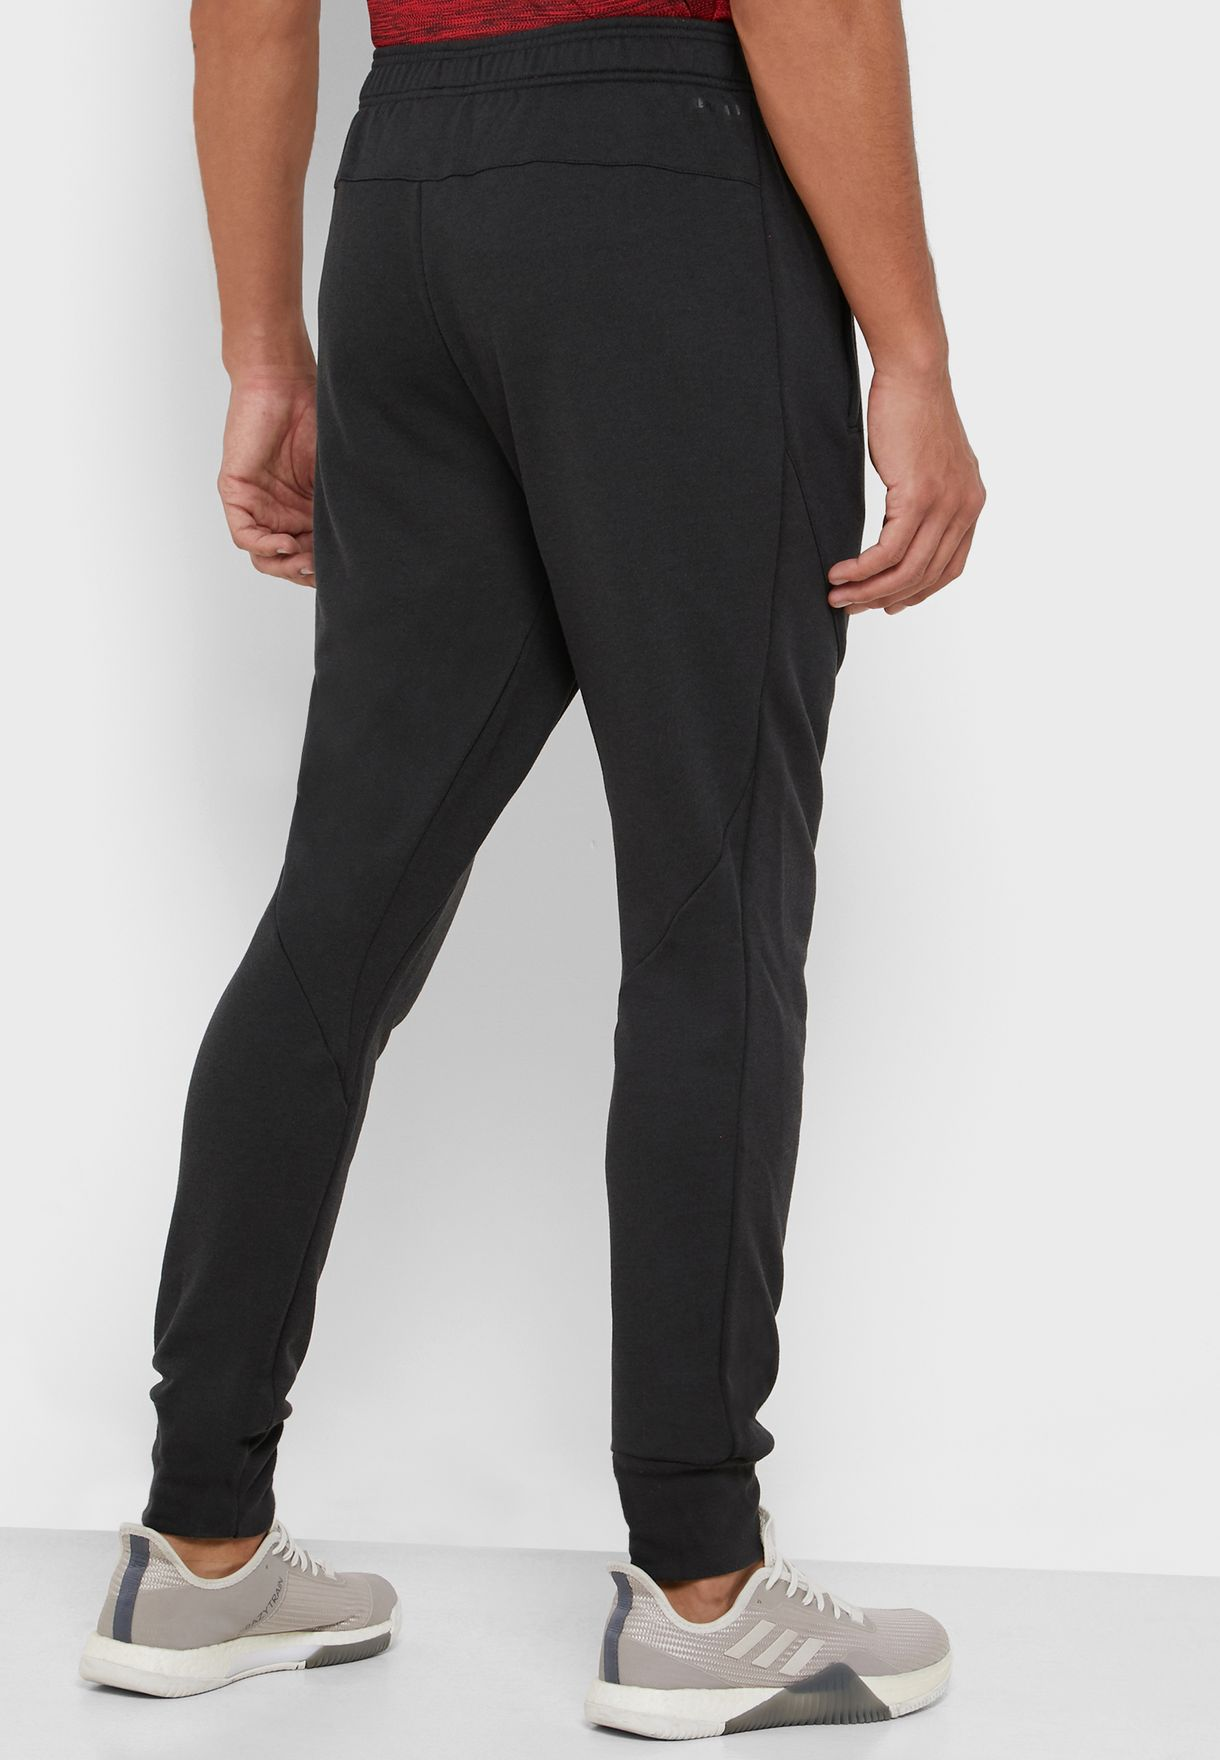 Designed4Training Sports Training Jogger Pants